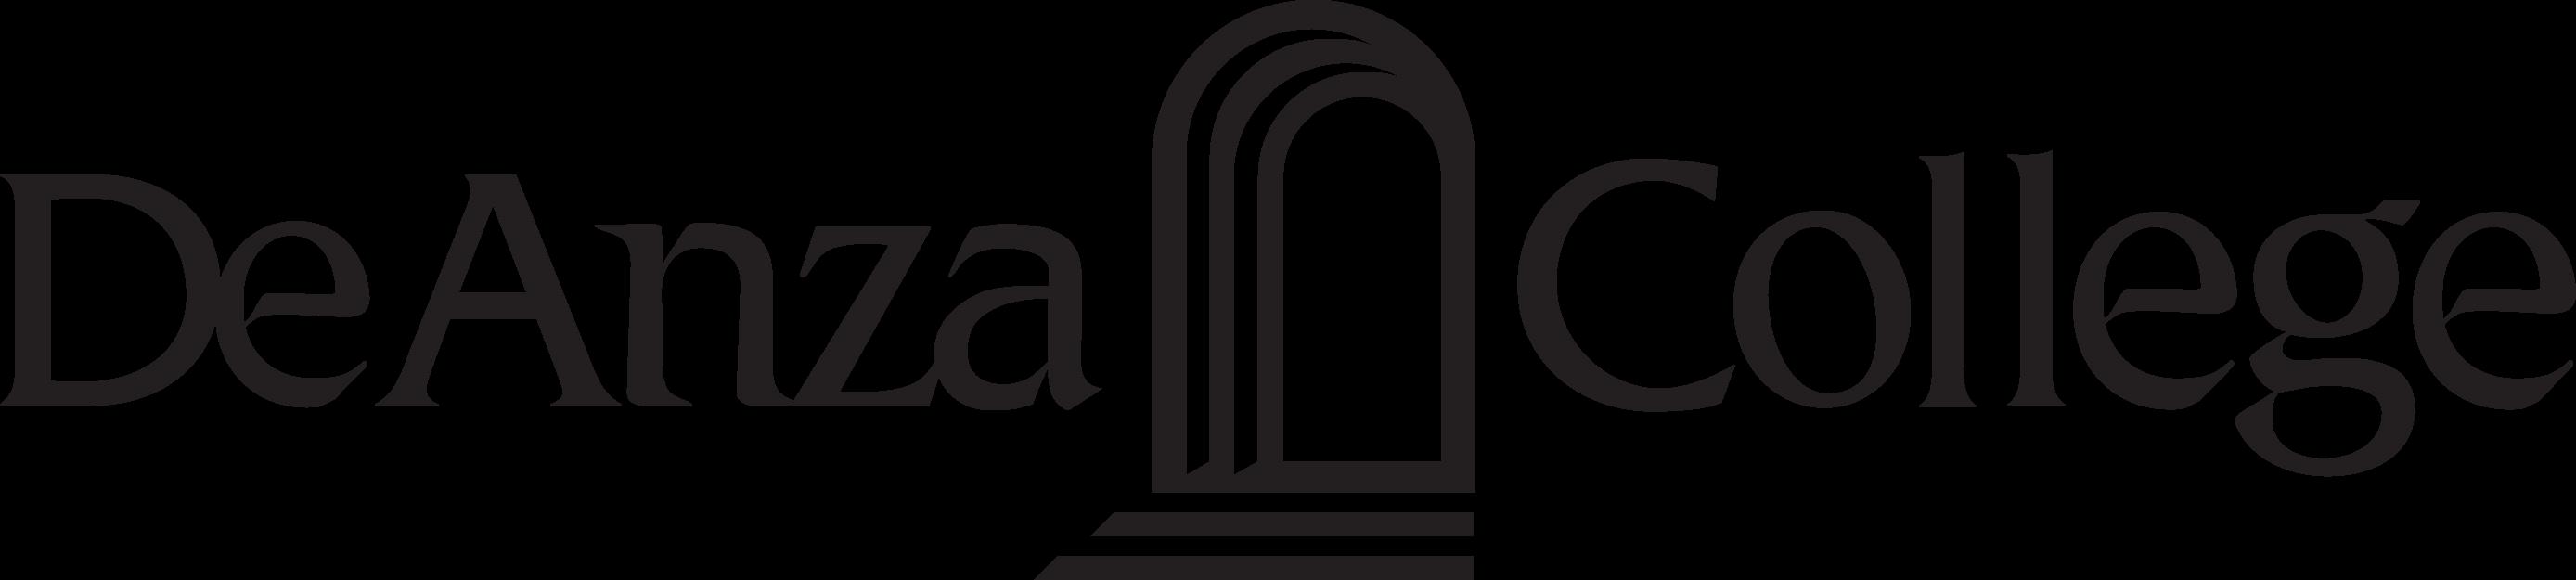 De Anza College logo